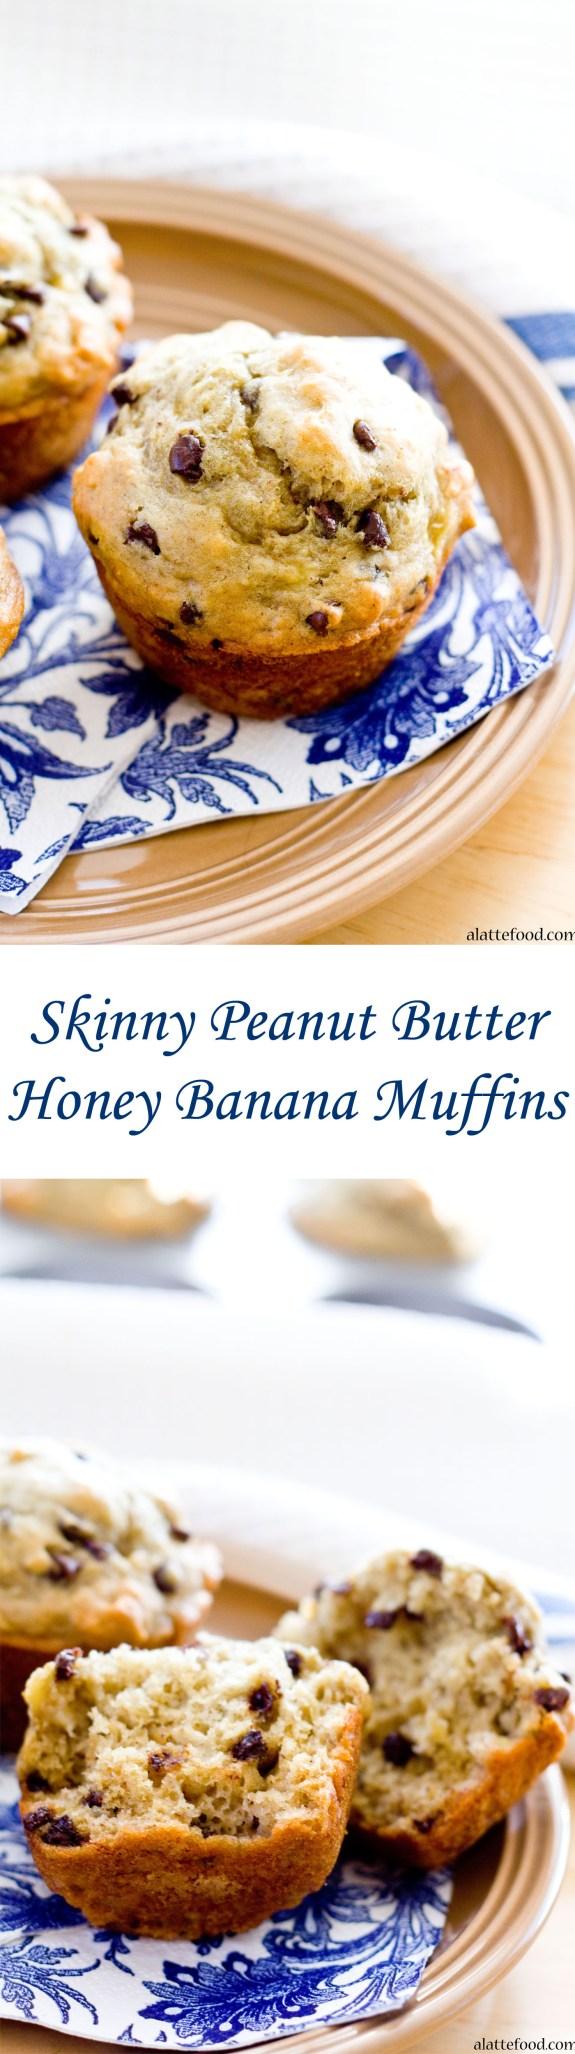 Skinny Peanut Butter Honey Banana Muffins   A Latte Food